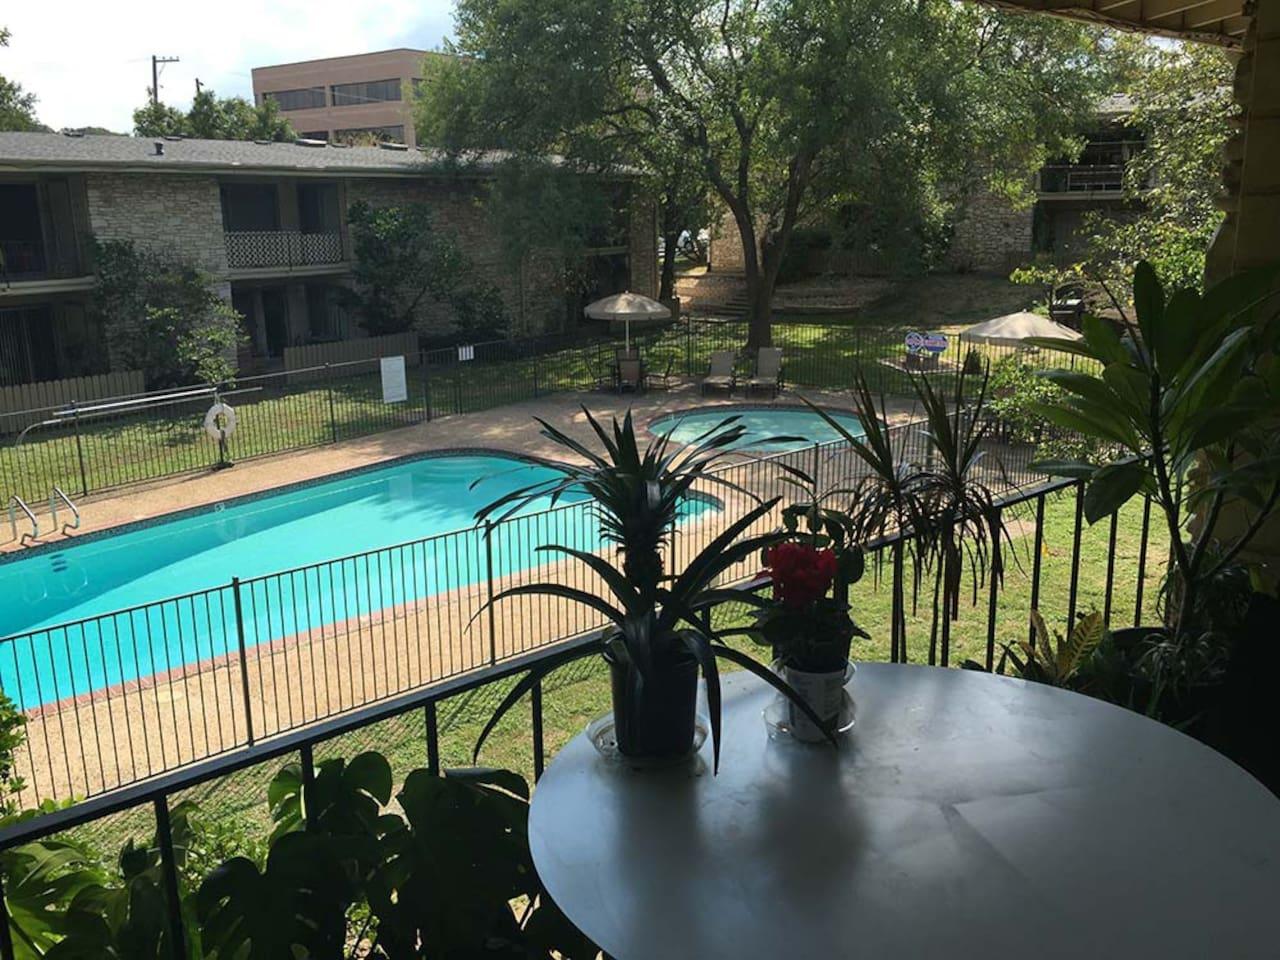 Overlooks swimming pool